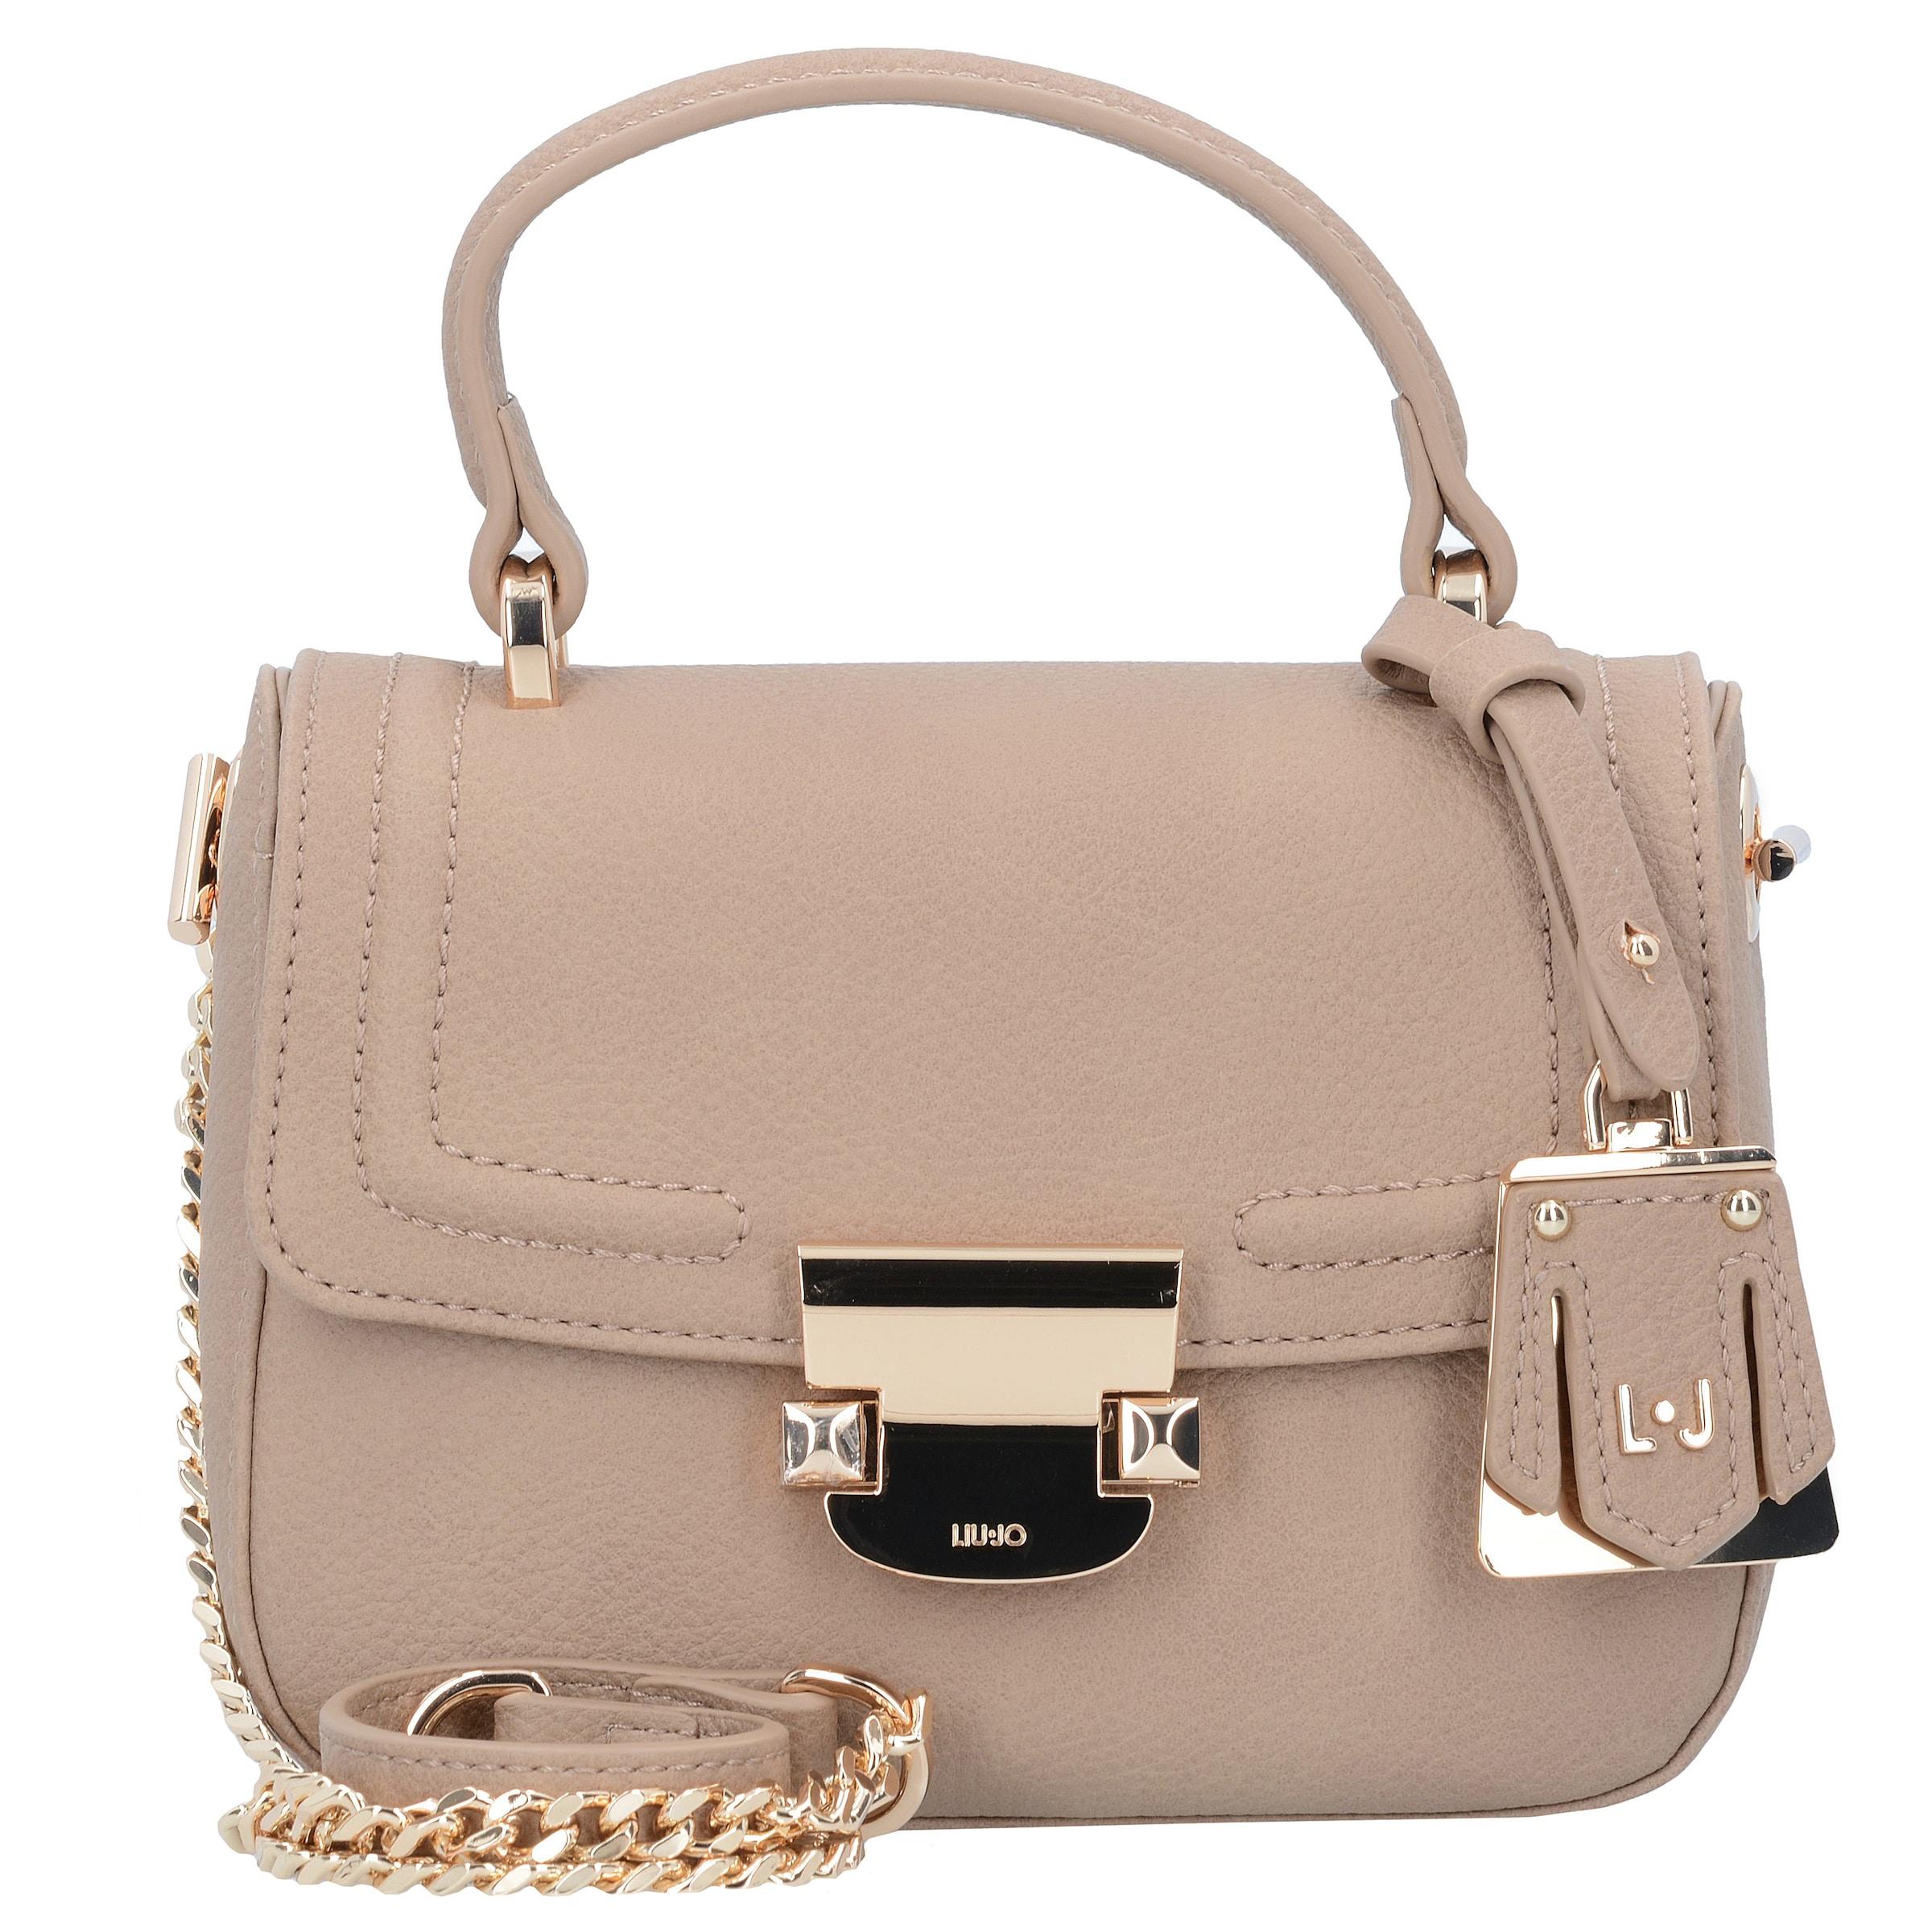 Liu Jo 'Long Island' Mini Bag Umhängetasche 19 cm Günstig Kauft Besten Platz YkPN6MRt5